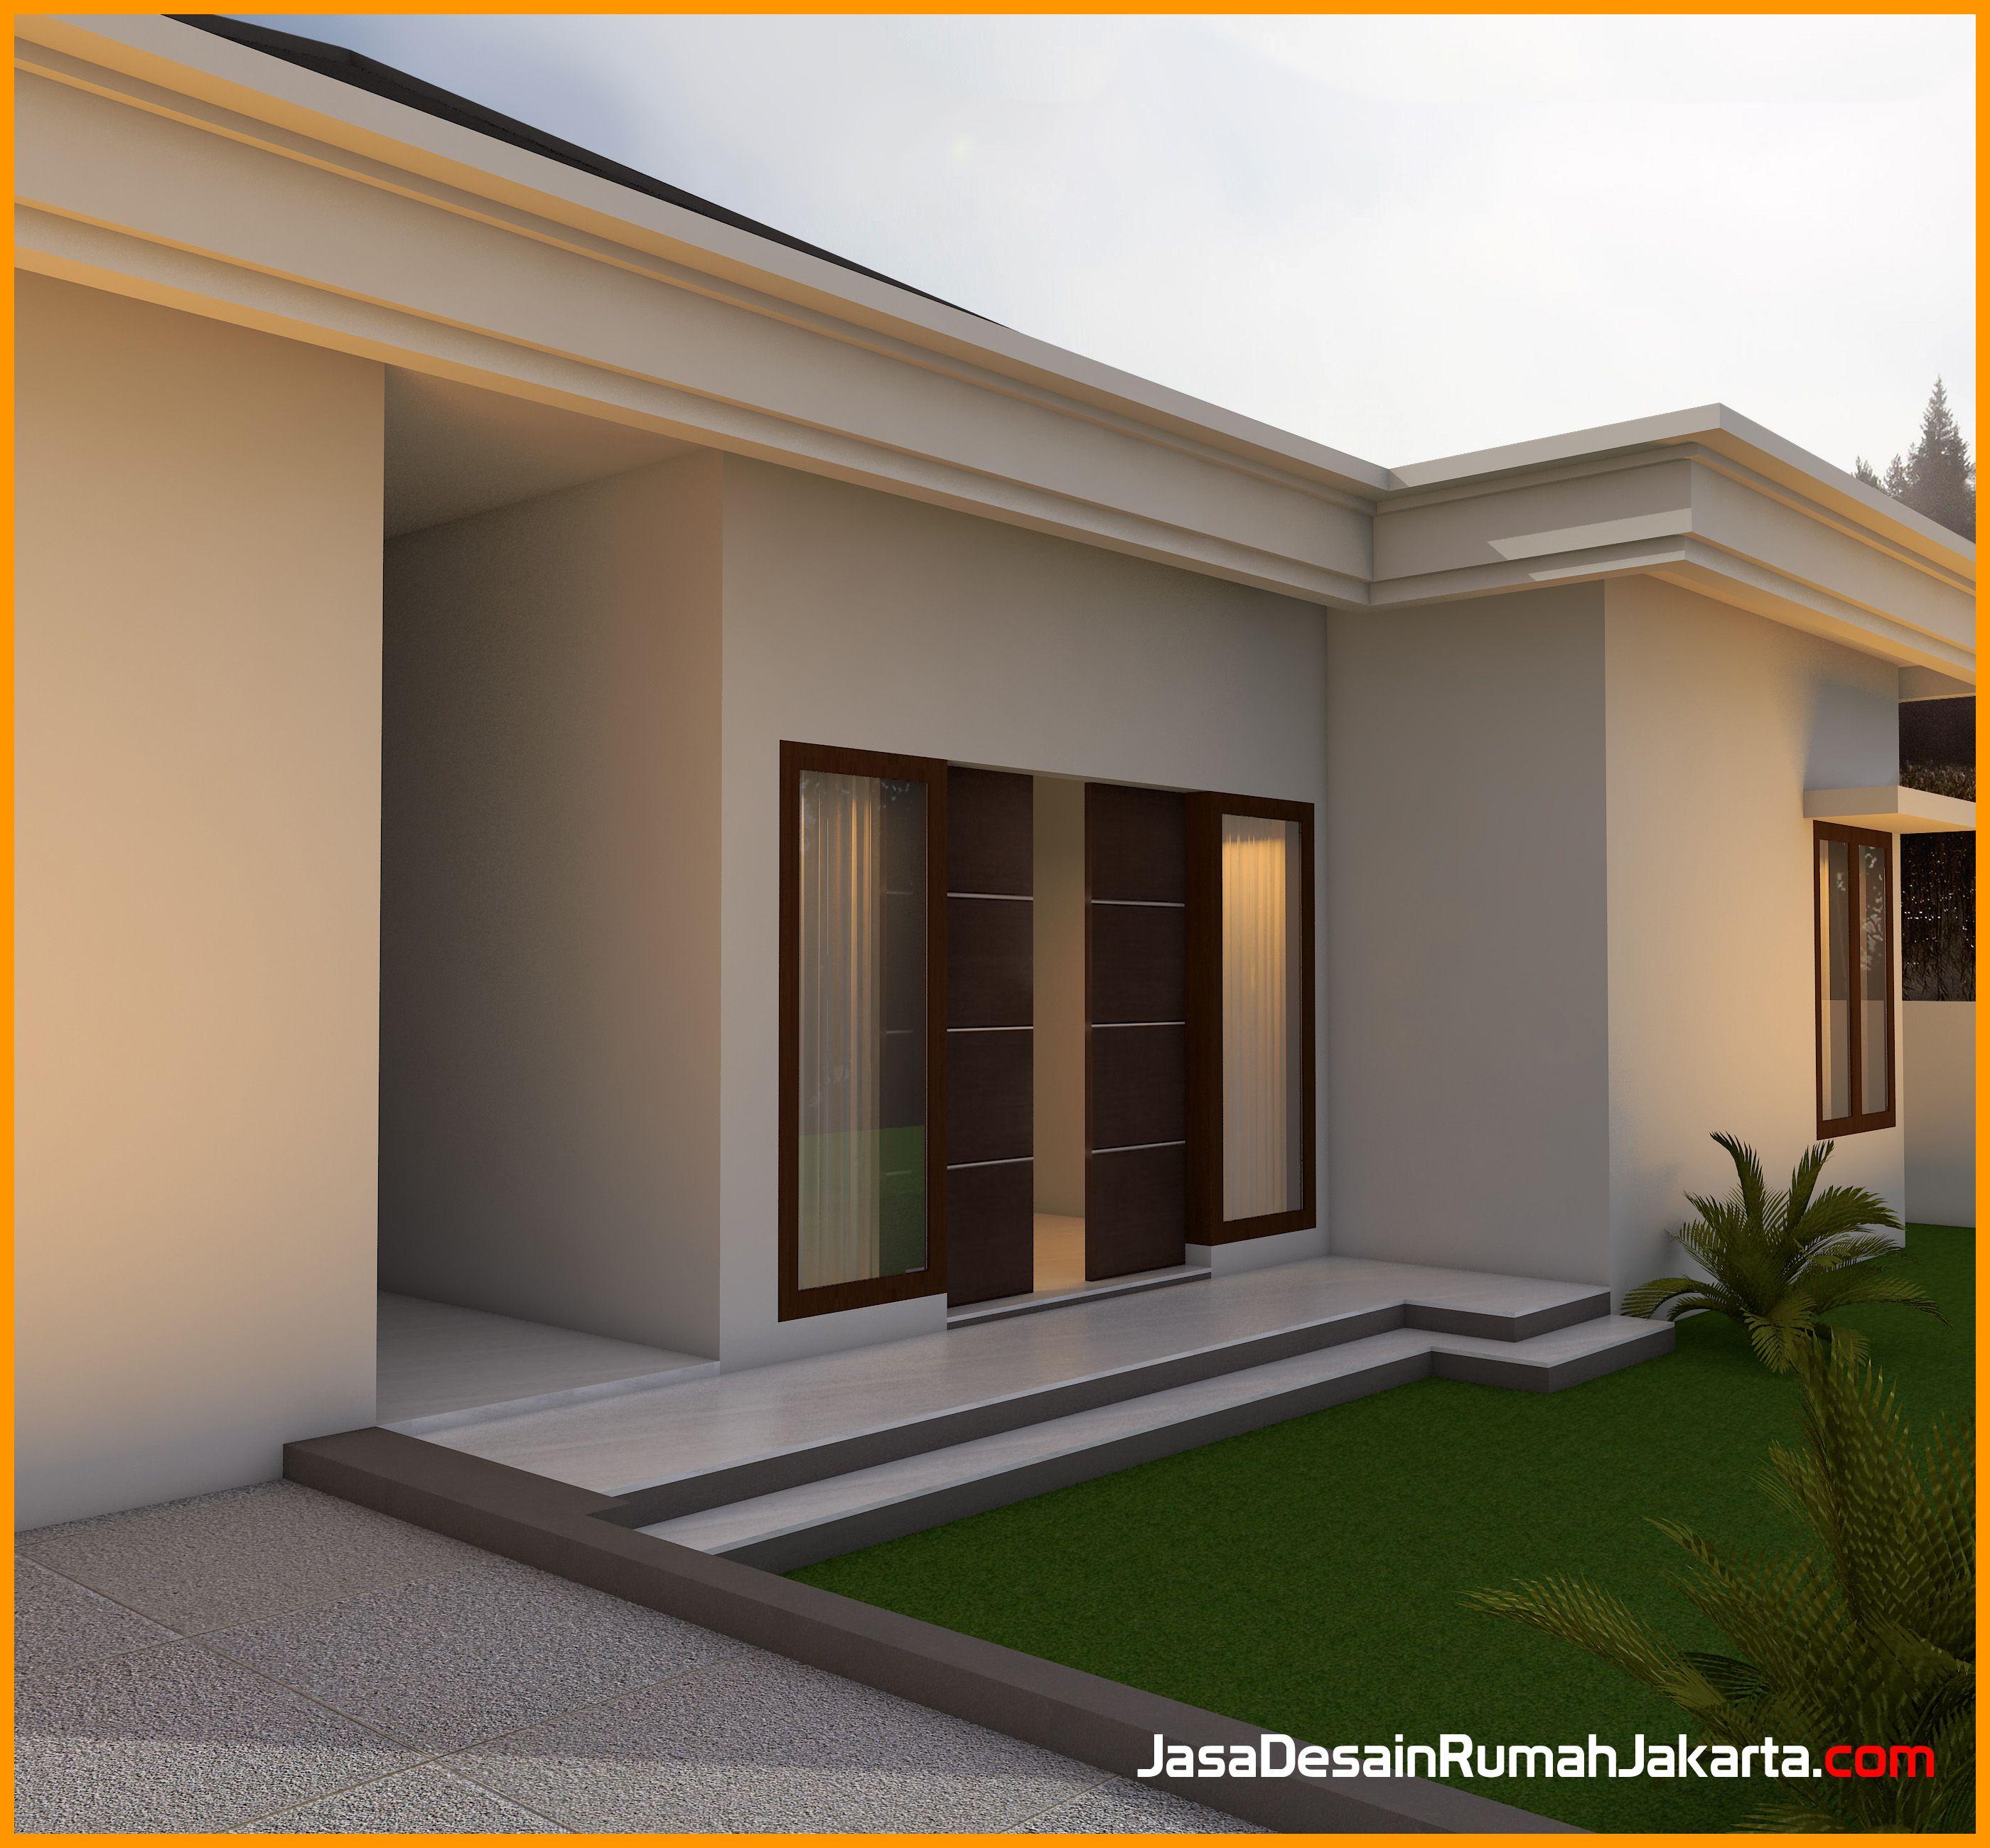 Model Desain Rumah Minimalis Modern Jasa Desain Rumah Jakarta In 2020 Outdoor Decor Decor Home